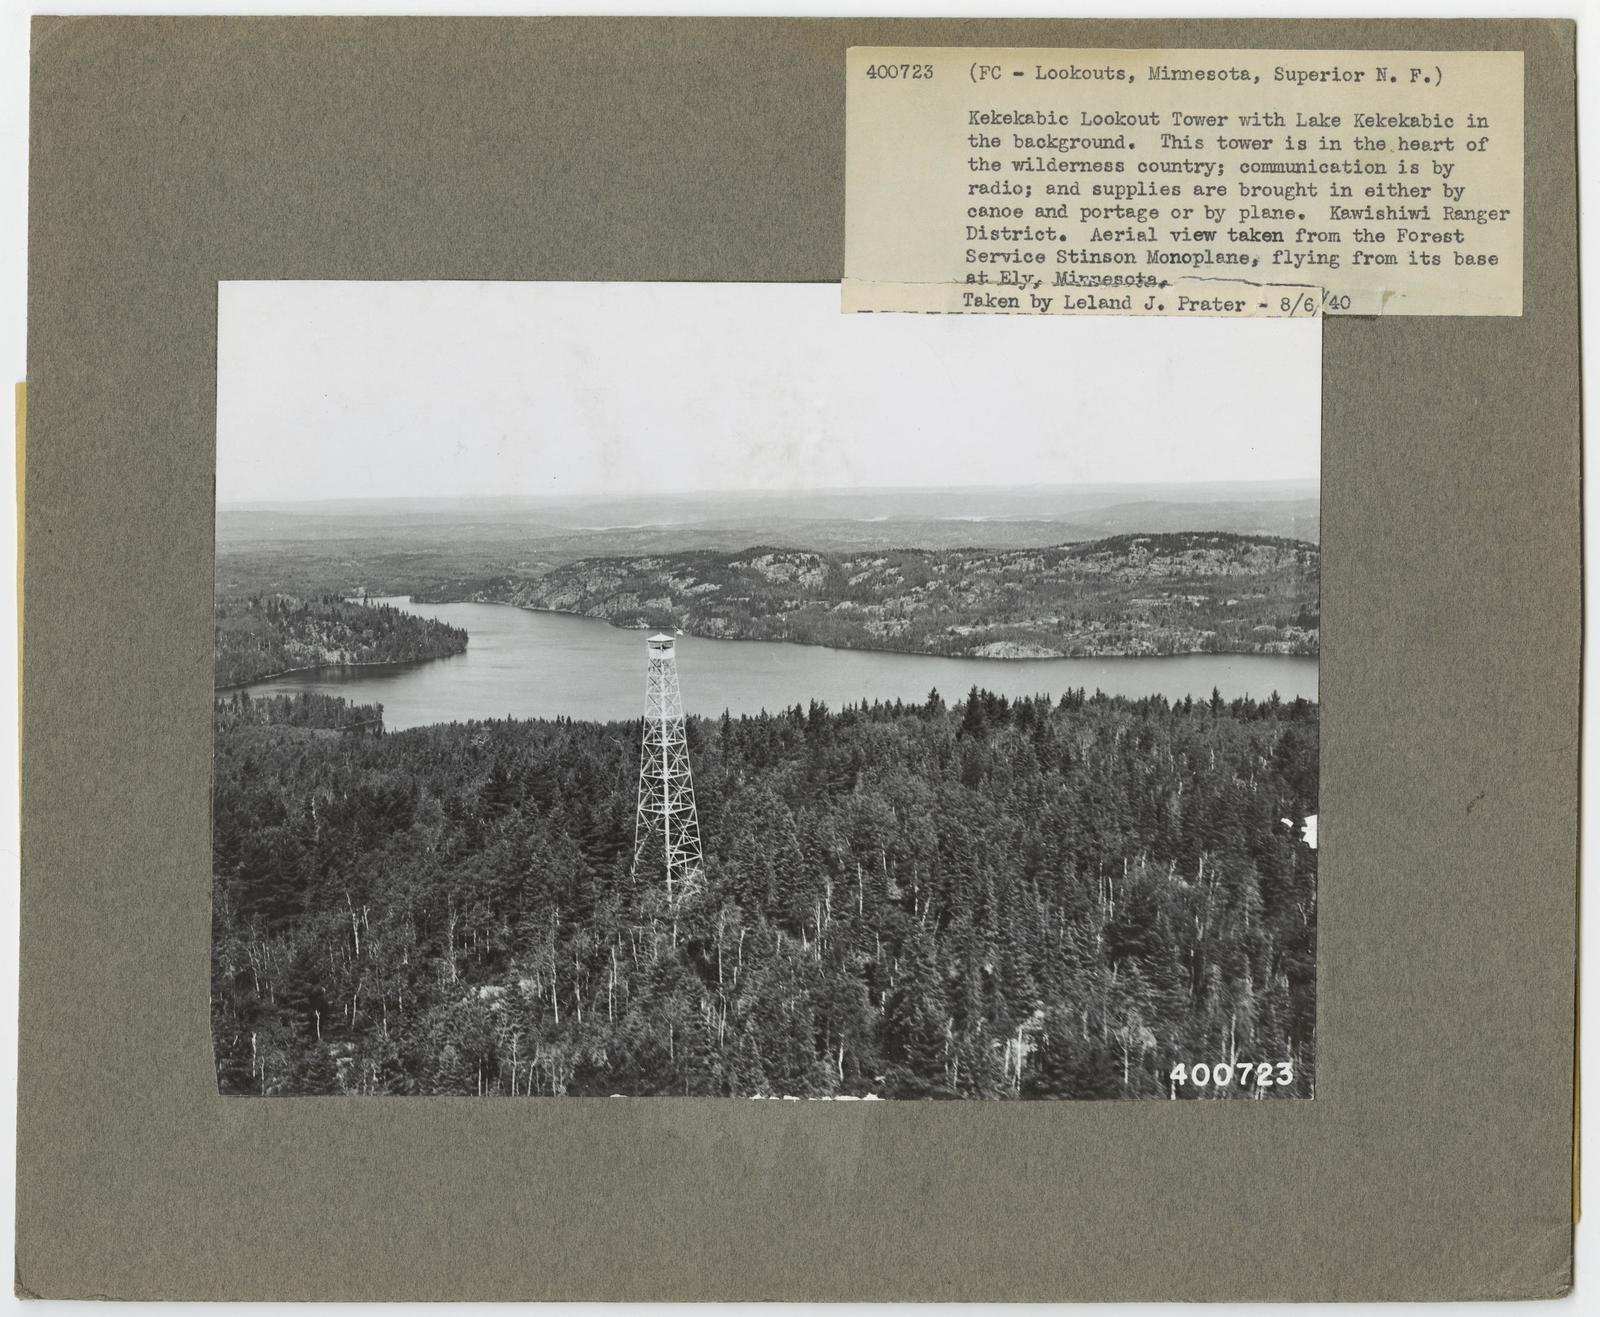 Fire Control: Lookouts - Minnesota